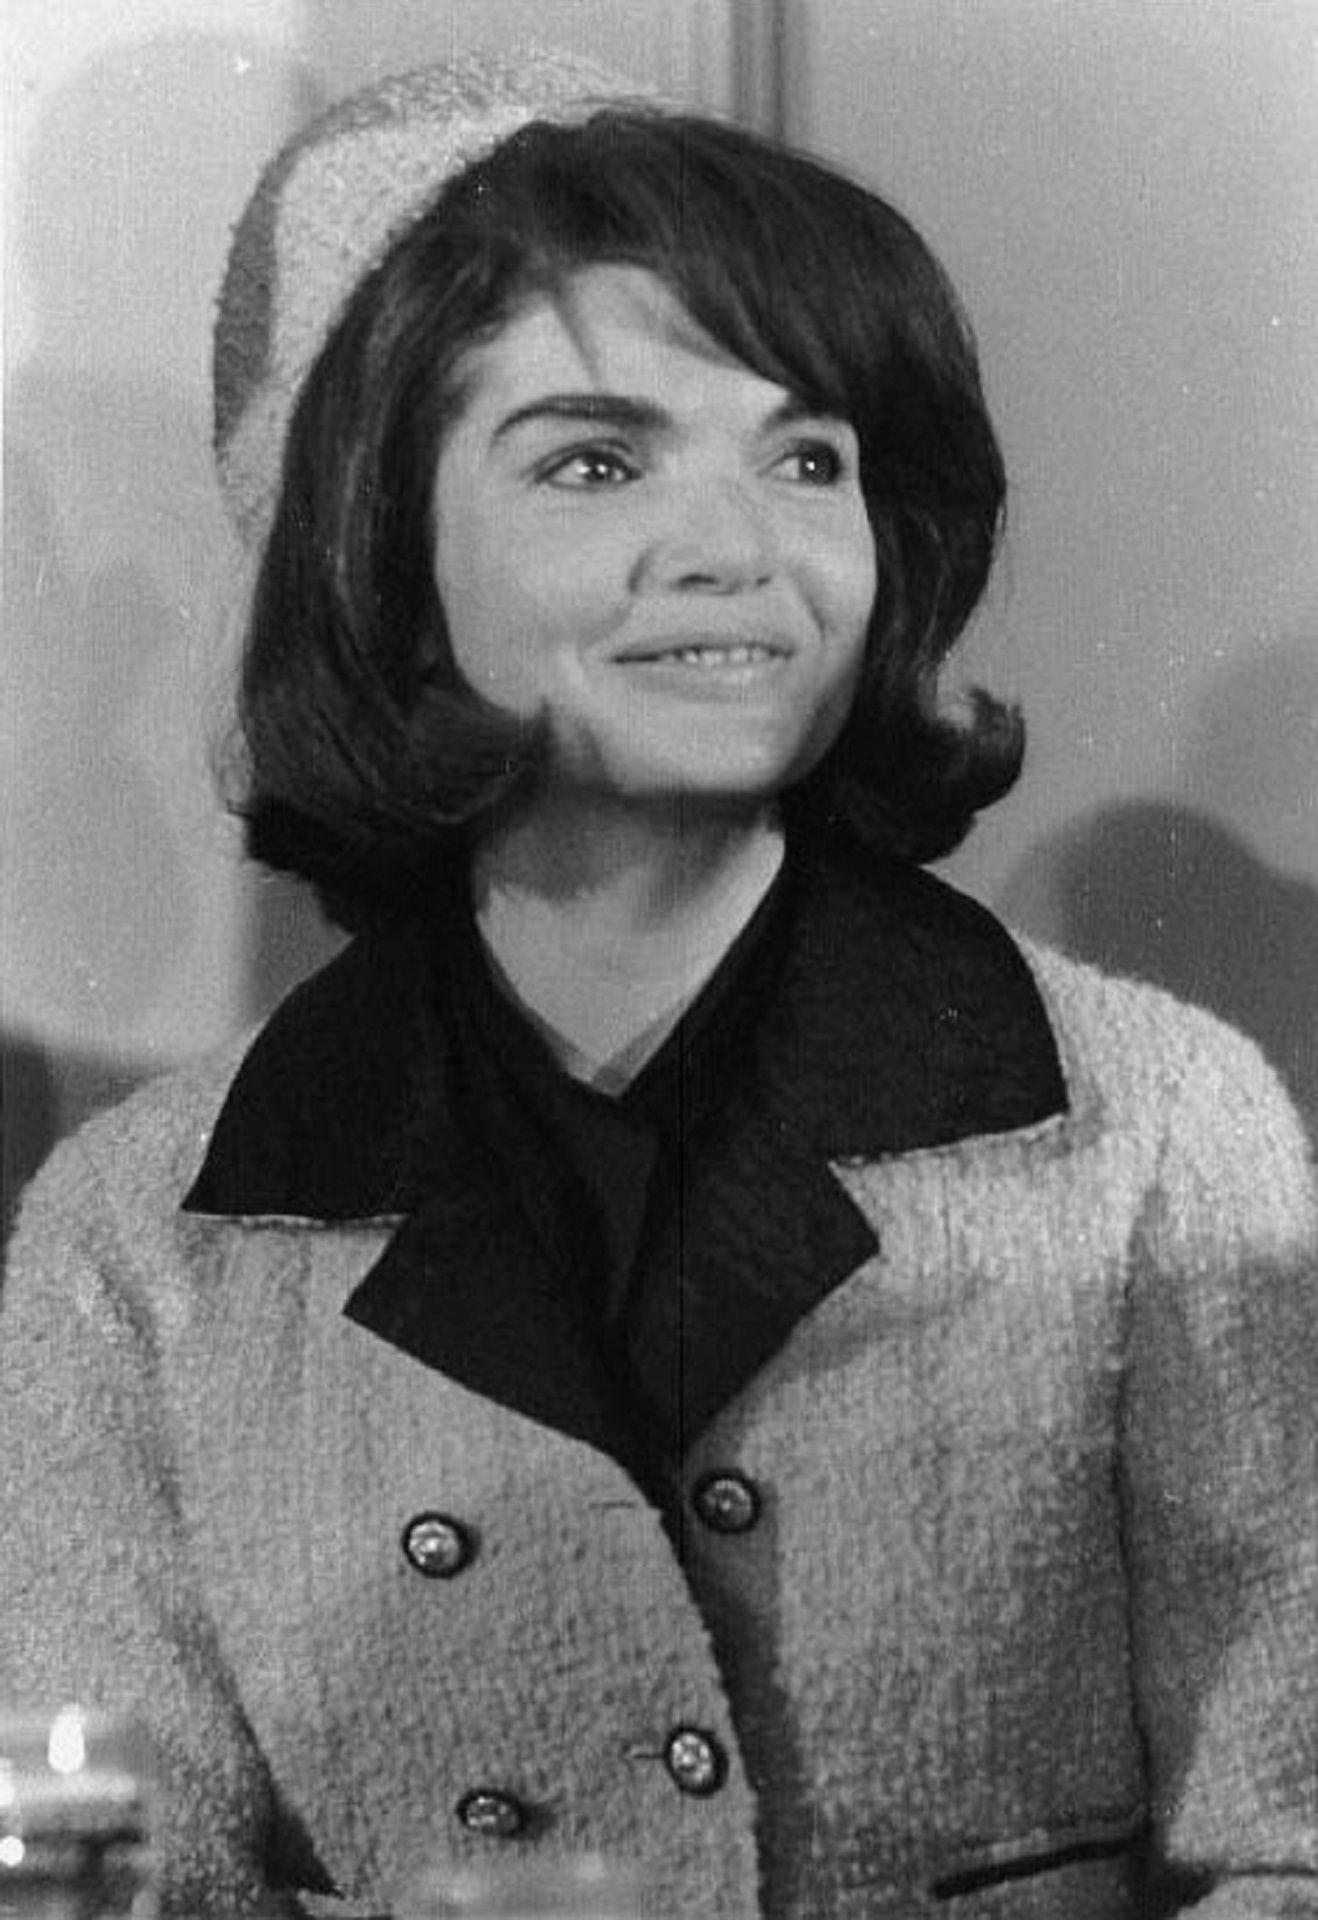 Jacqueline-Kennedy in Melanie Trump oder Jackie Kennedy?